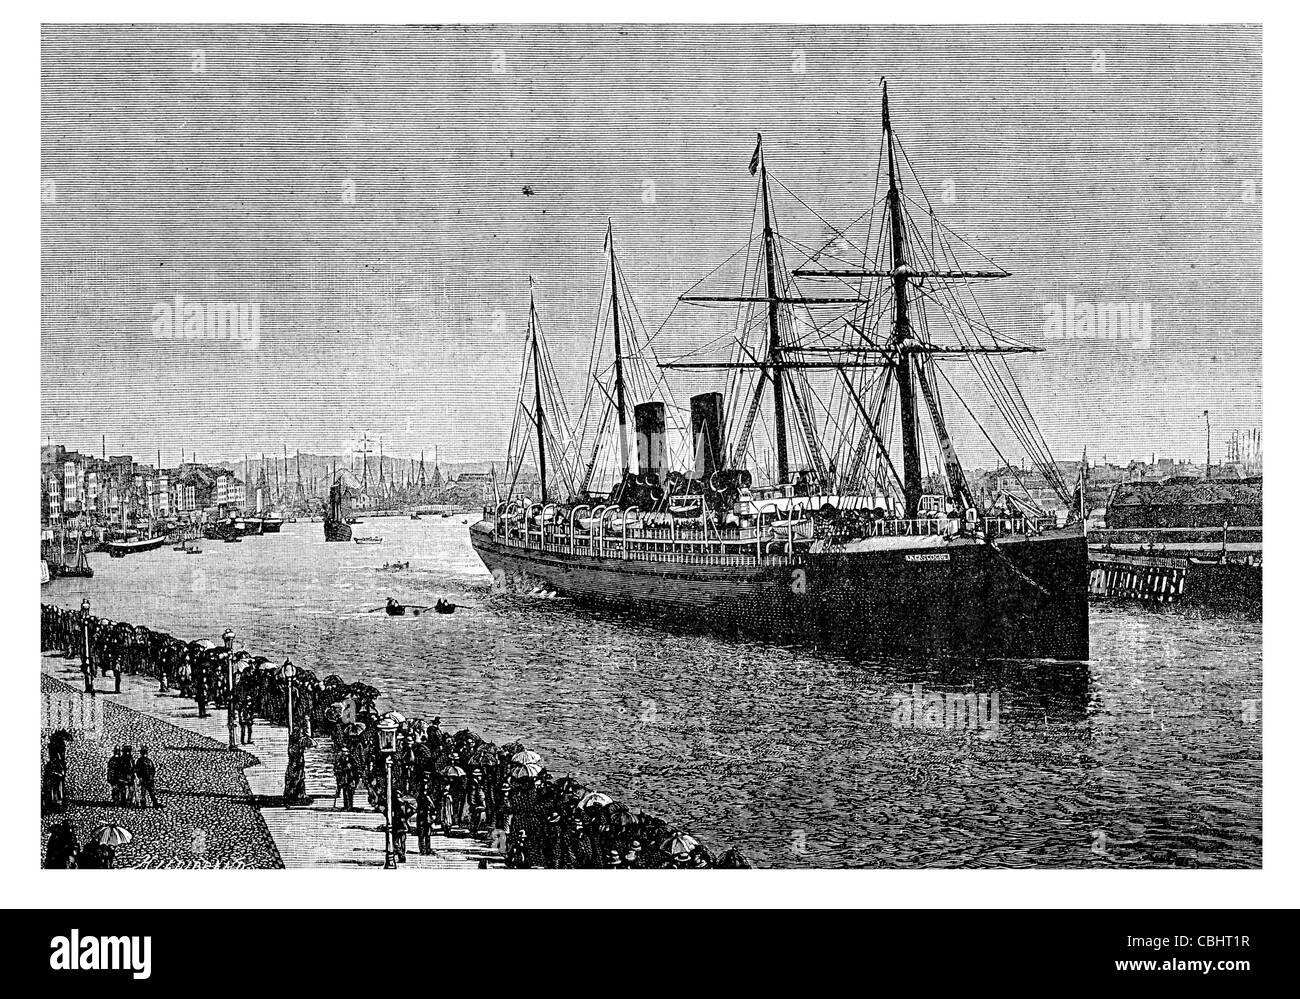 The Transatlantic Mail steamer Gascony  port Le Havre dock harbout quay liner Stock Photo